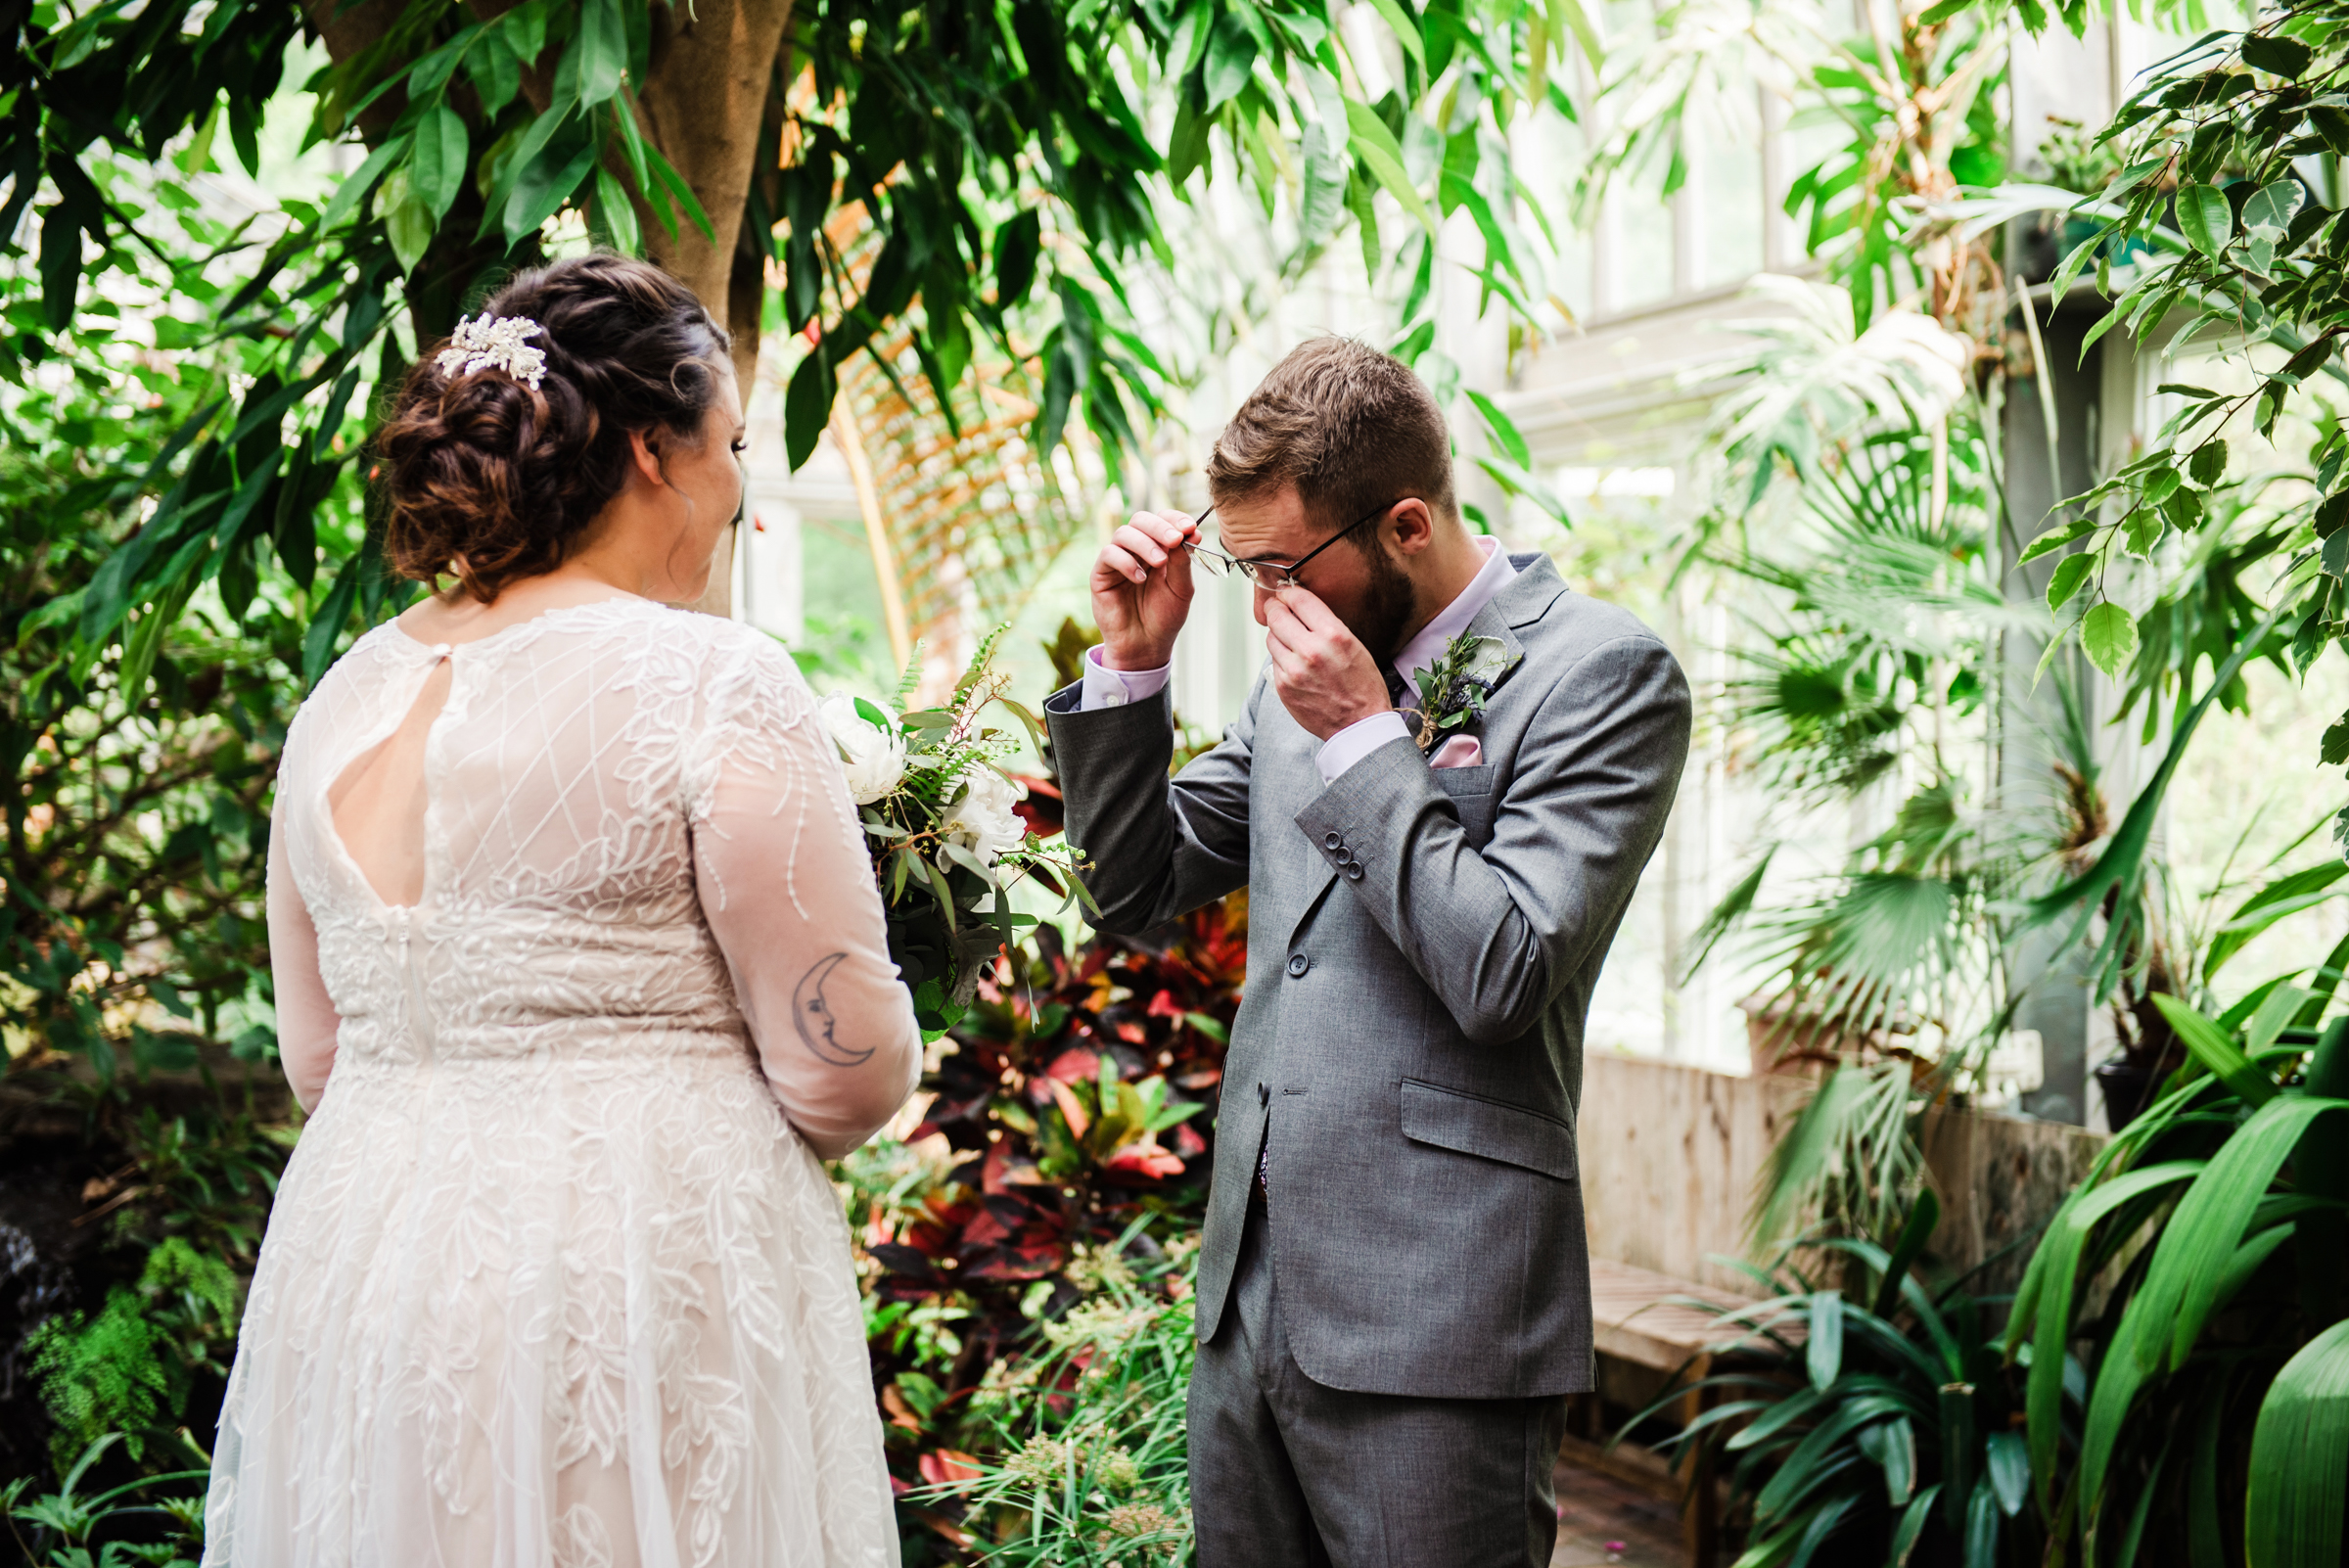 Studio_180_Lamberton_Conservatory_Rochester_Wedding_JILL_STUDIO_Rochester_NY_Photographer_DSC_8372.jpg